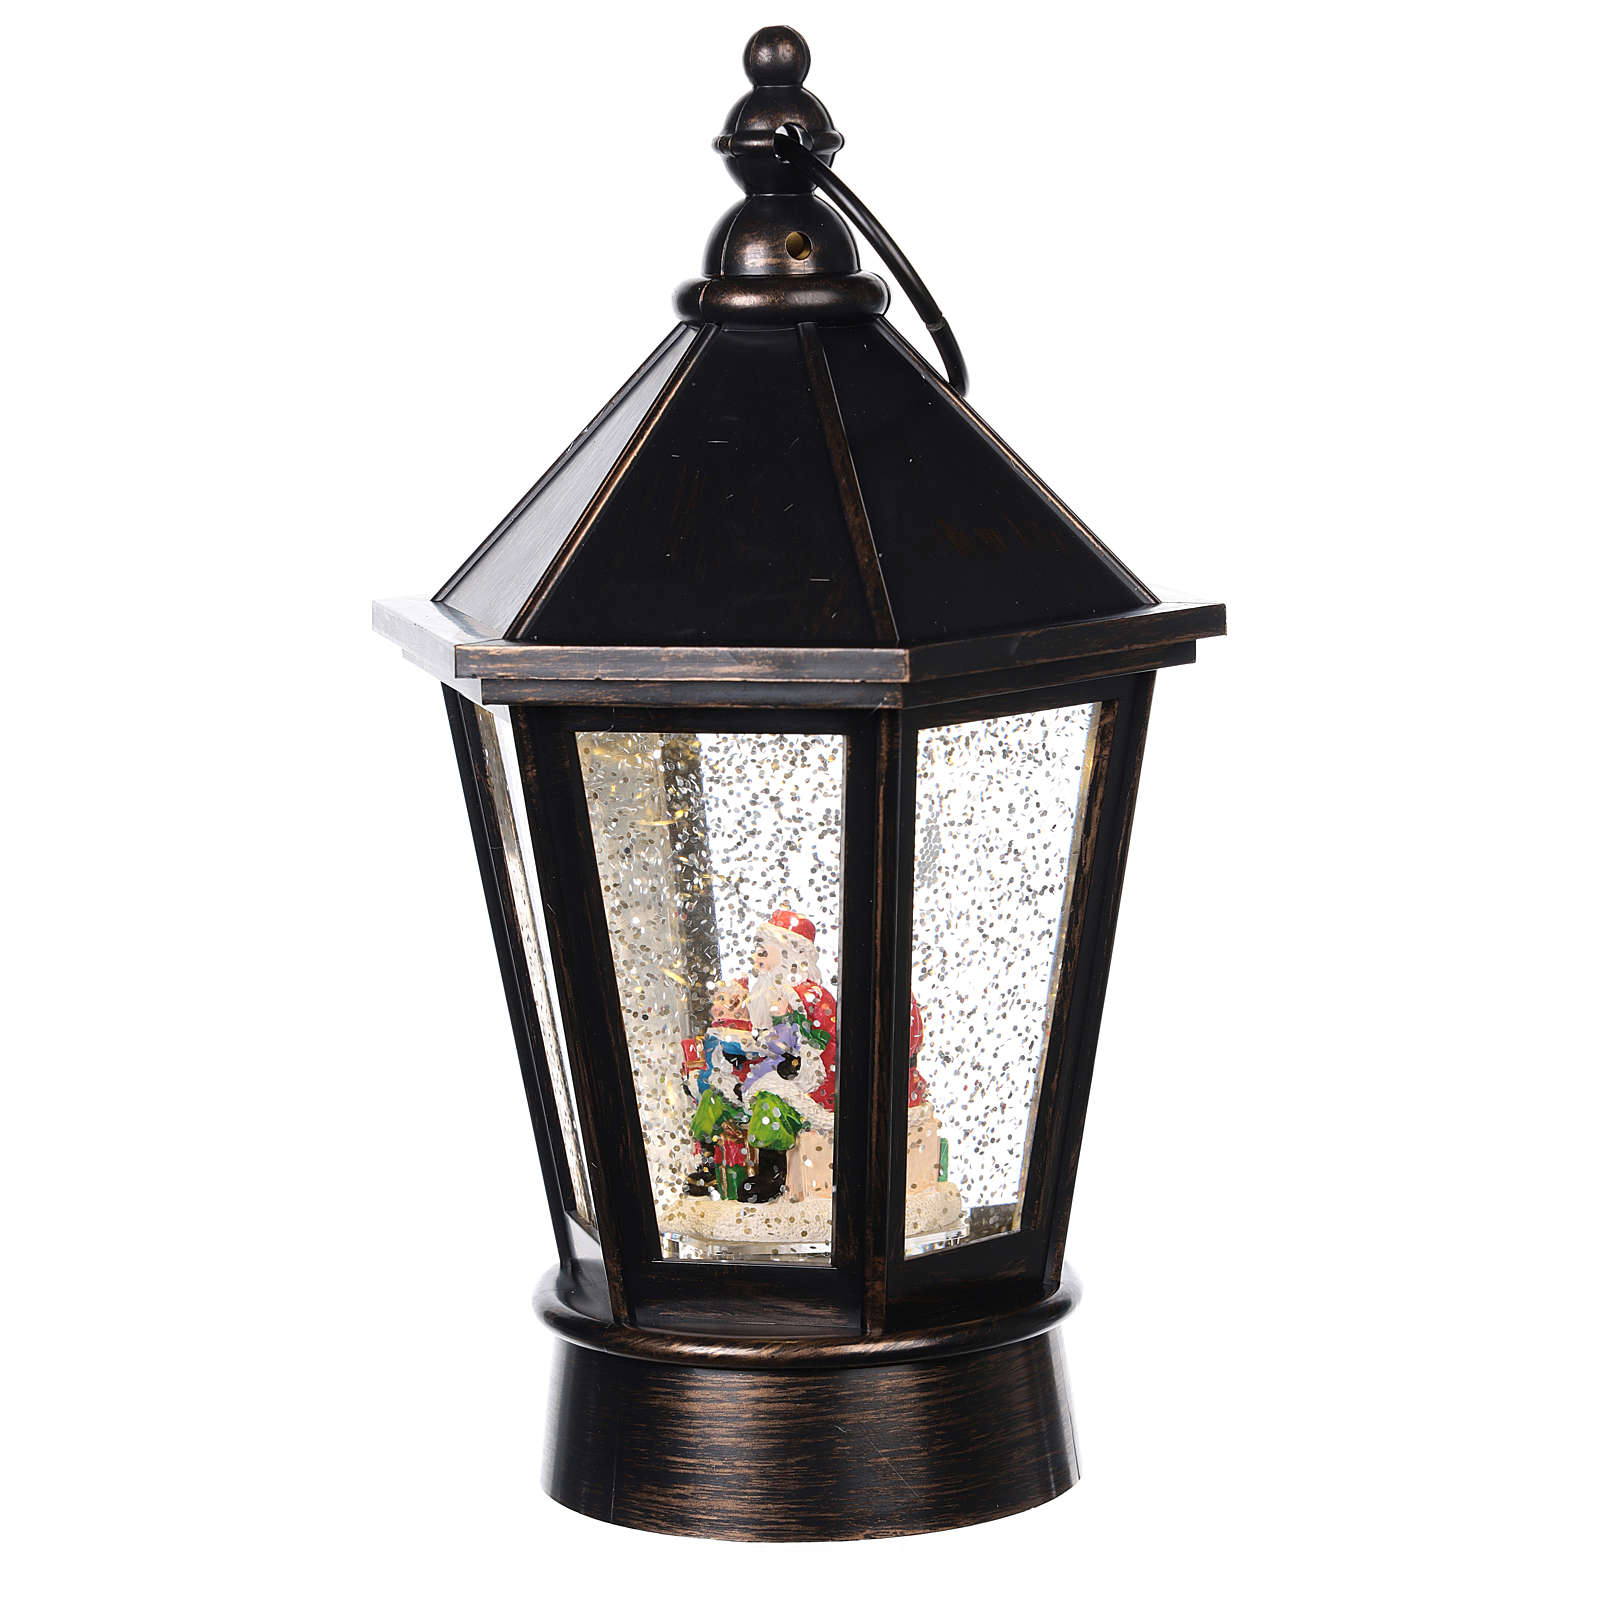 Bola de vidrio linterna con Papá Noel 25x10 cm 3